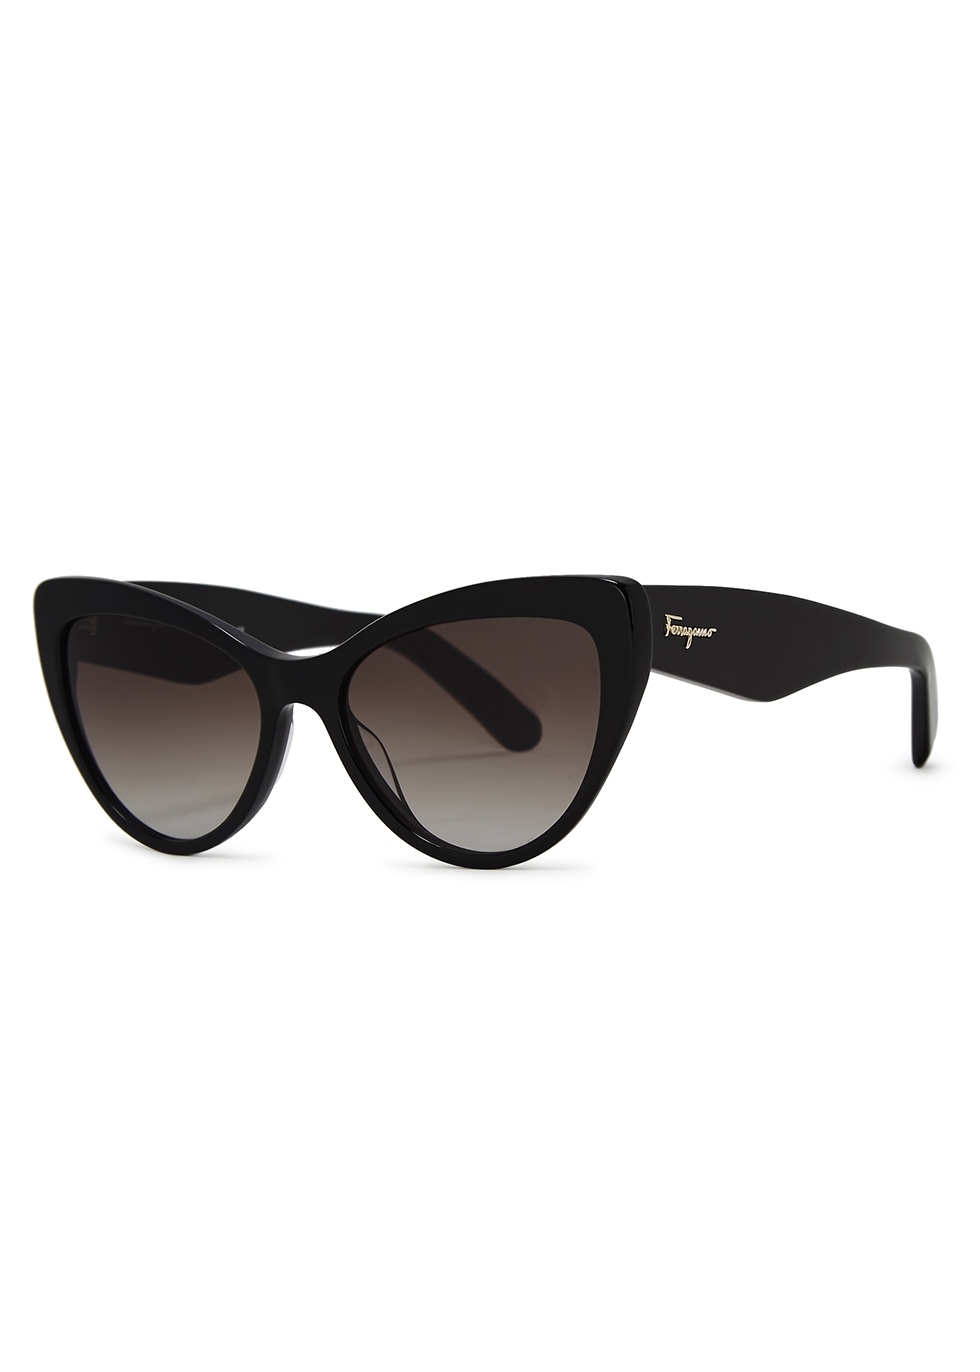 Black cat-eye sunglasses - Salvatore Ferragamo